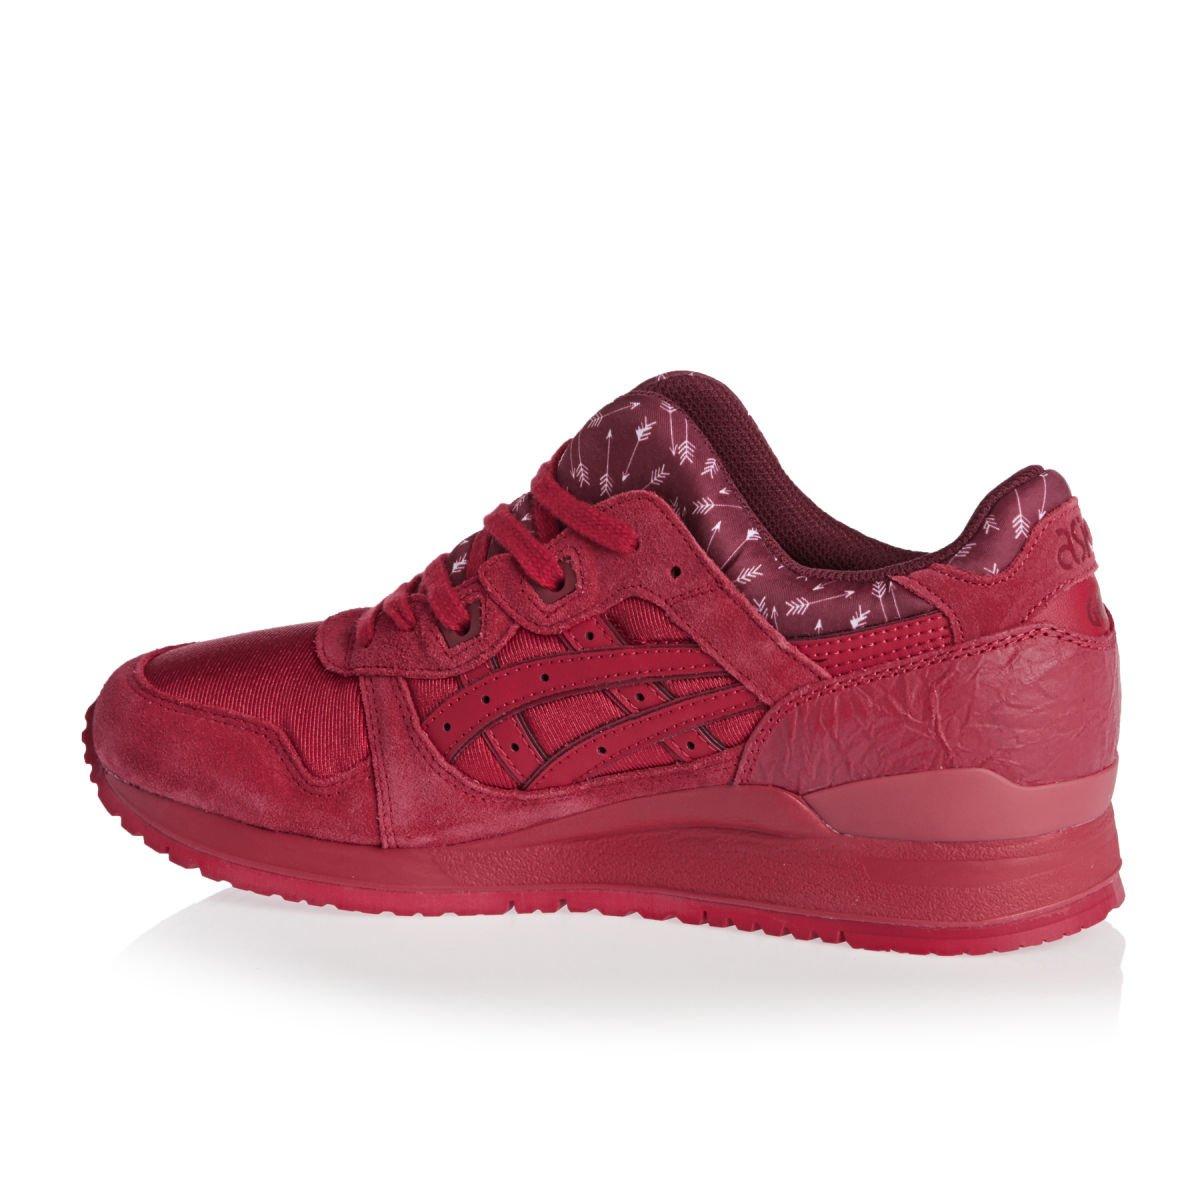 Asics Gel-Lyte III Schuhe Schuhe III Sneaker Turnschuhe Rot H63QQ 2323 Rot edc365